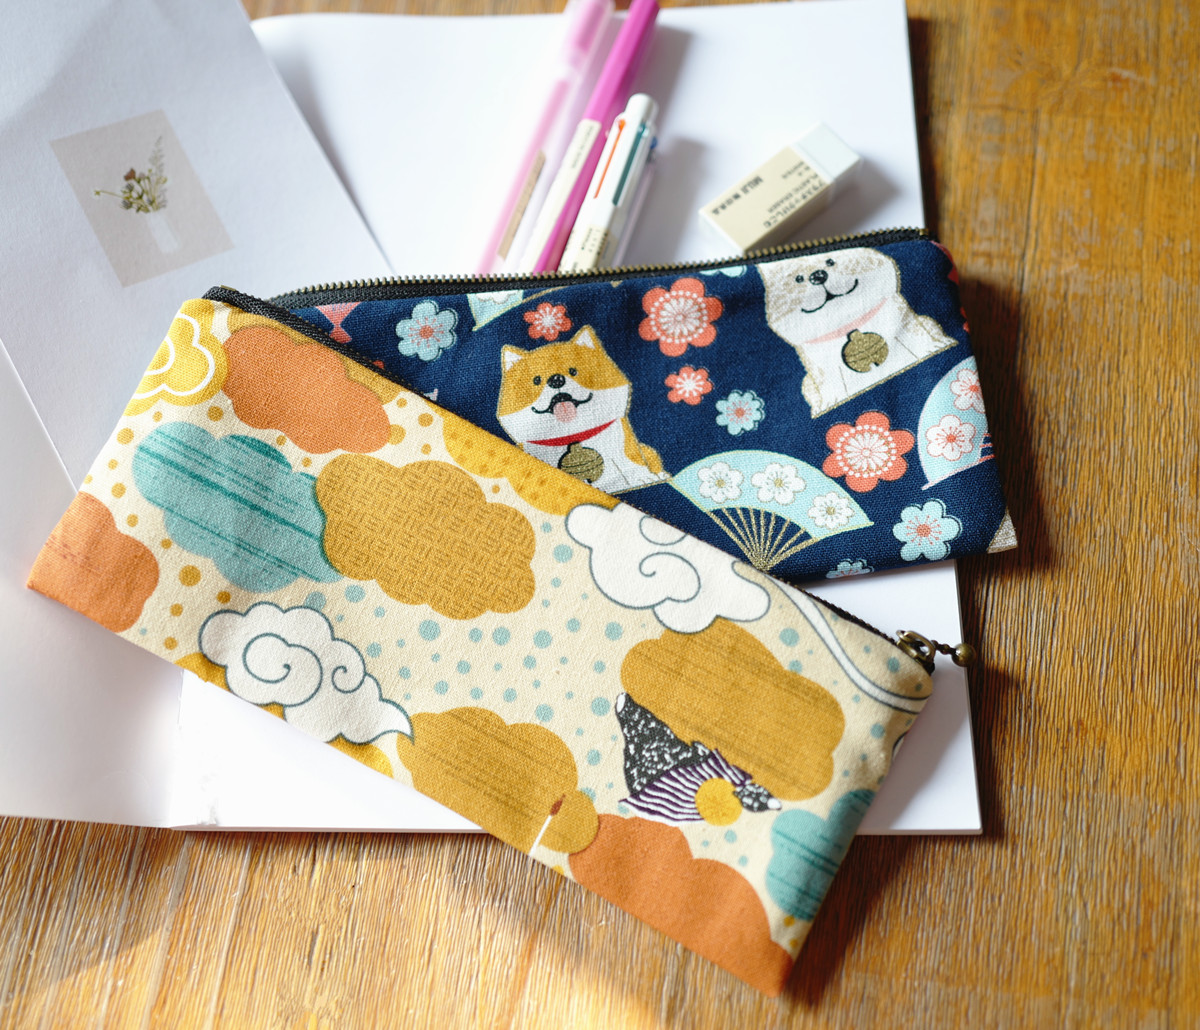 Little Paris Handmade Japanese Style Kids Purse Coin Purse Pencil Case Cute Shiba Inu Lucky Cat Fabric Storage Pen Bag